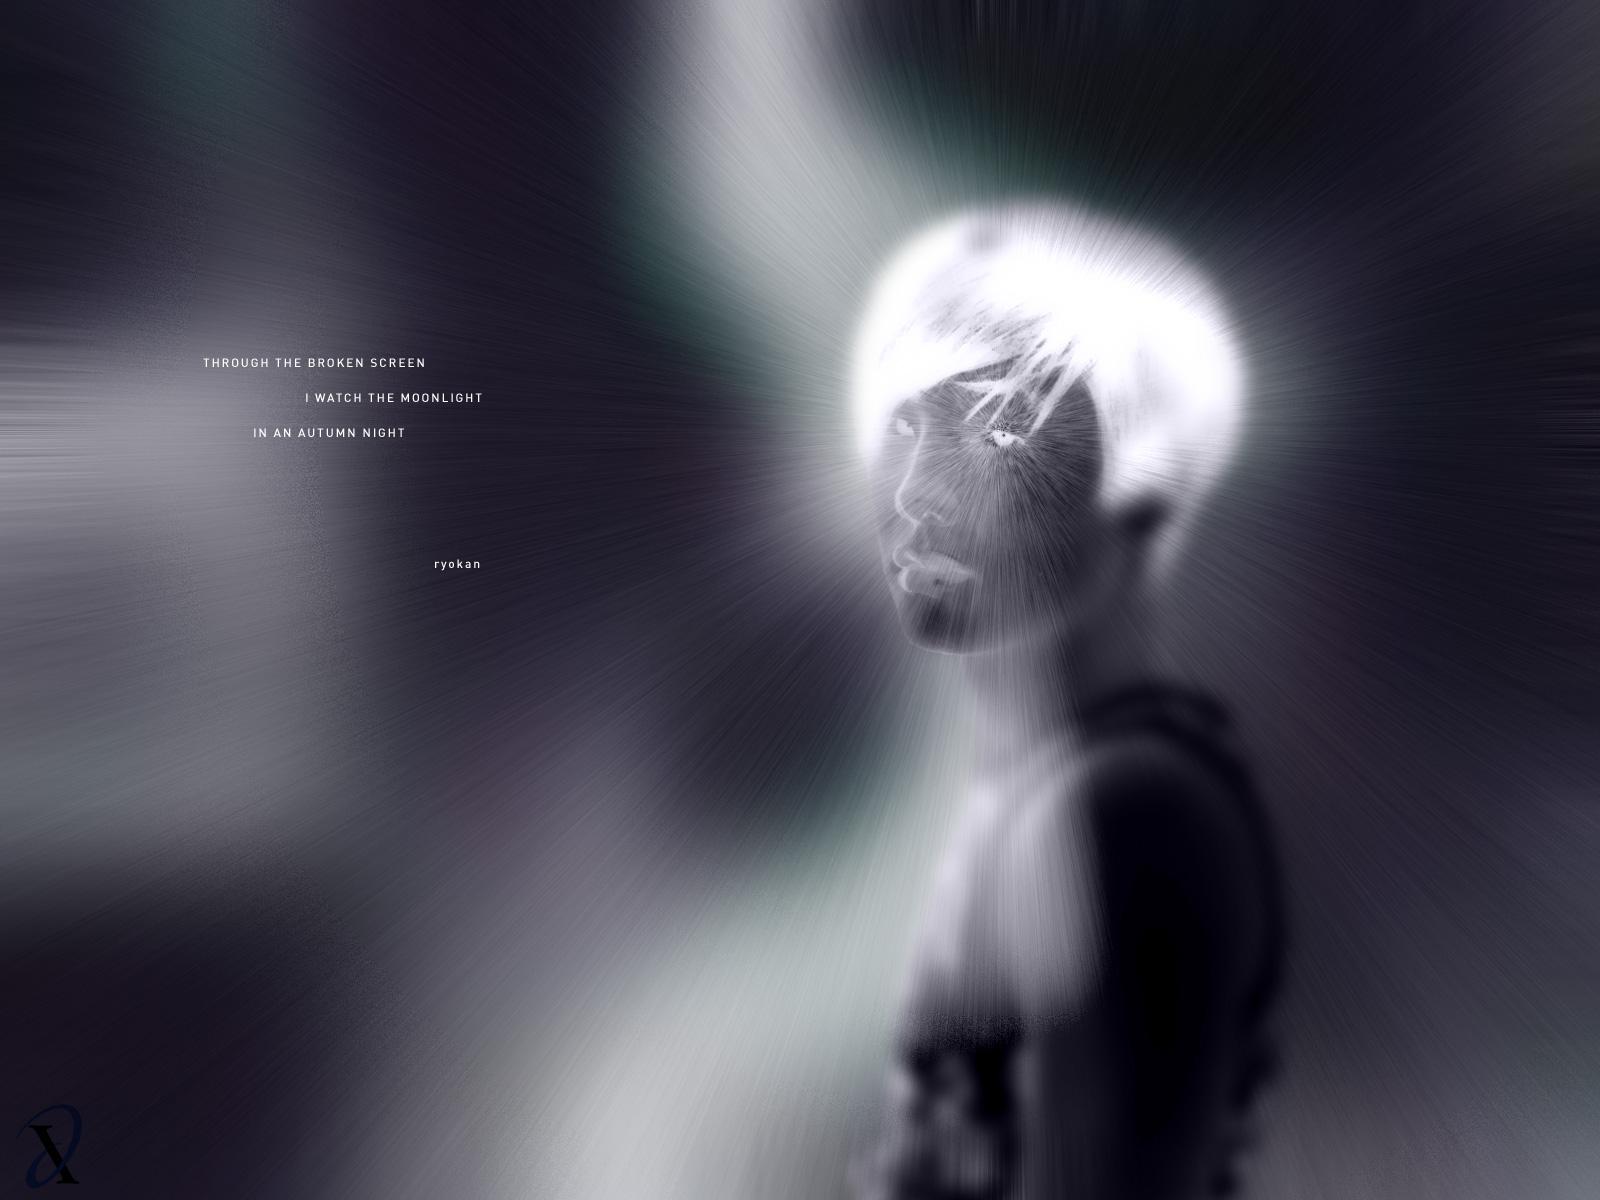 Ikebana - Broken Screen by xeophin-net